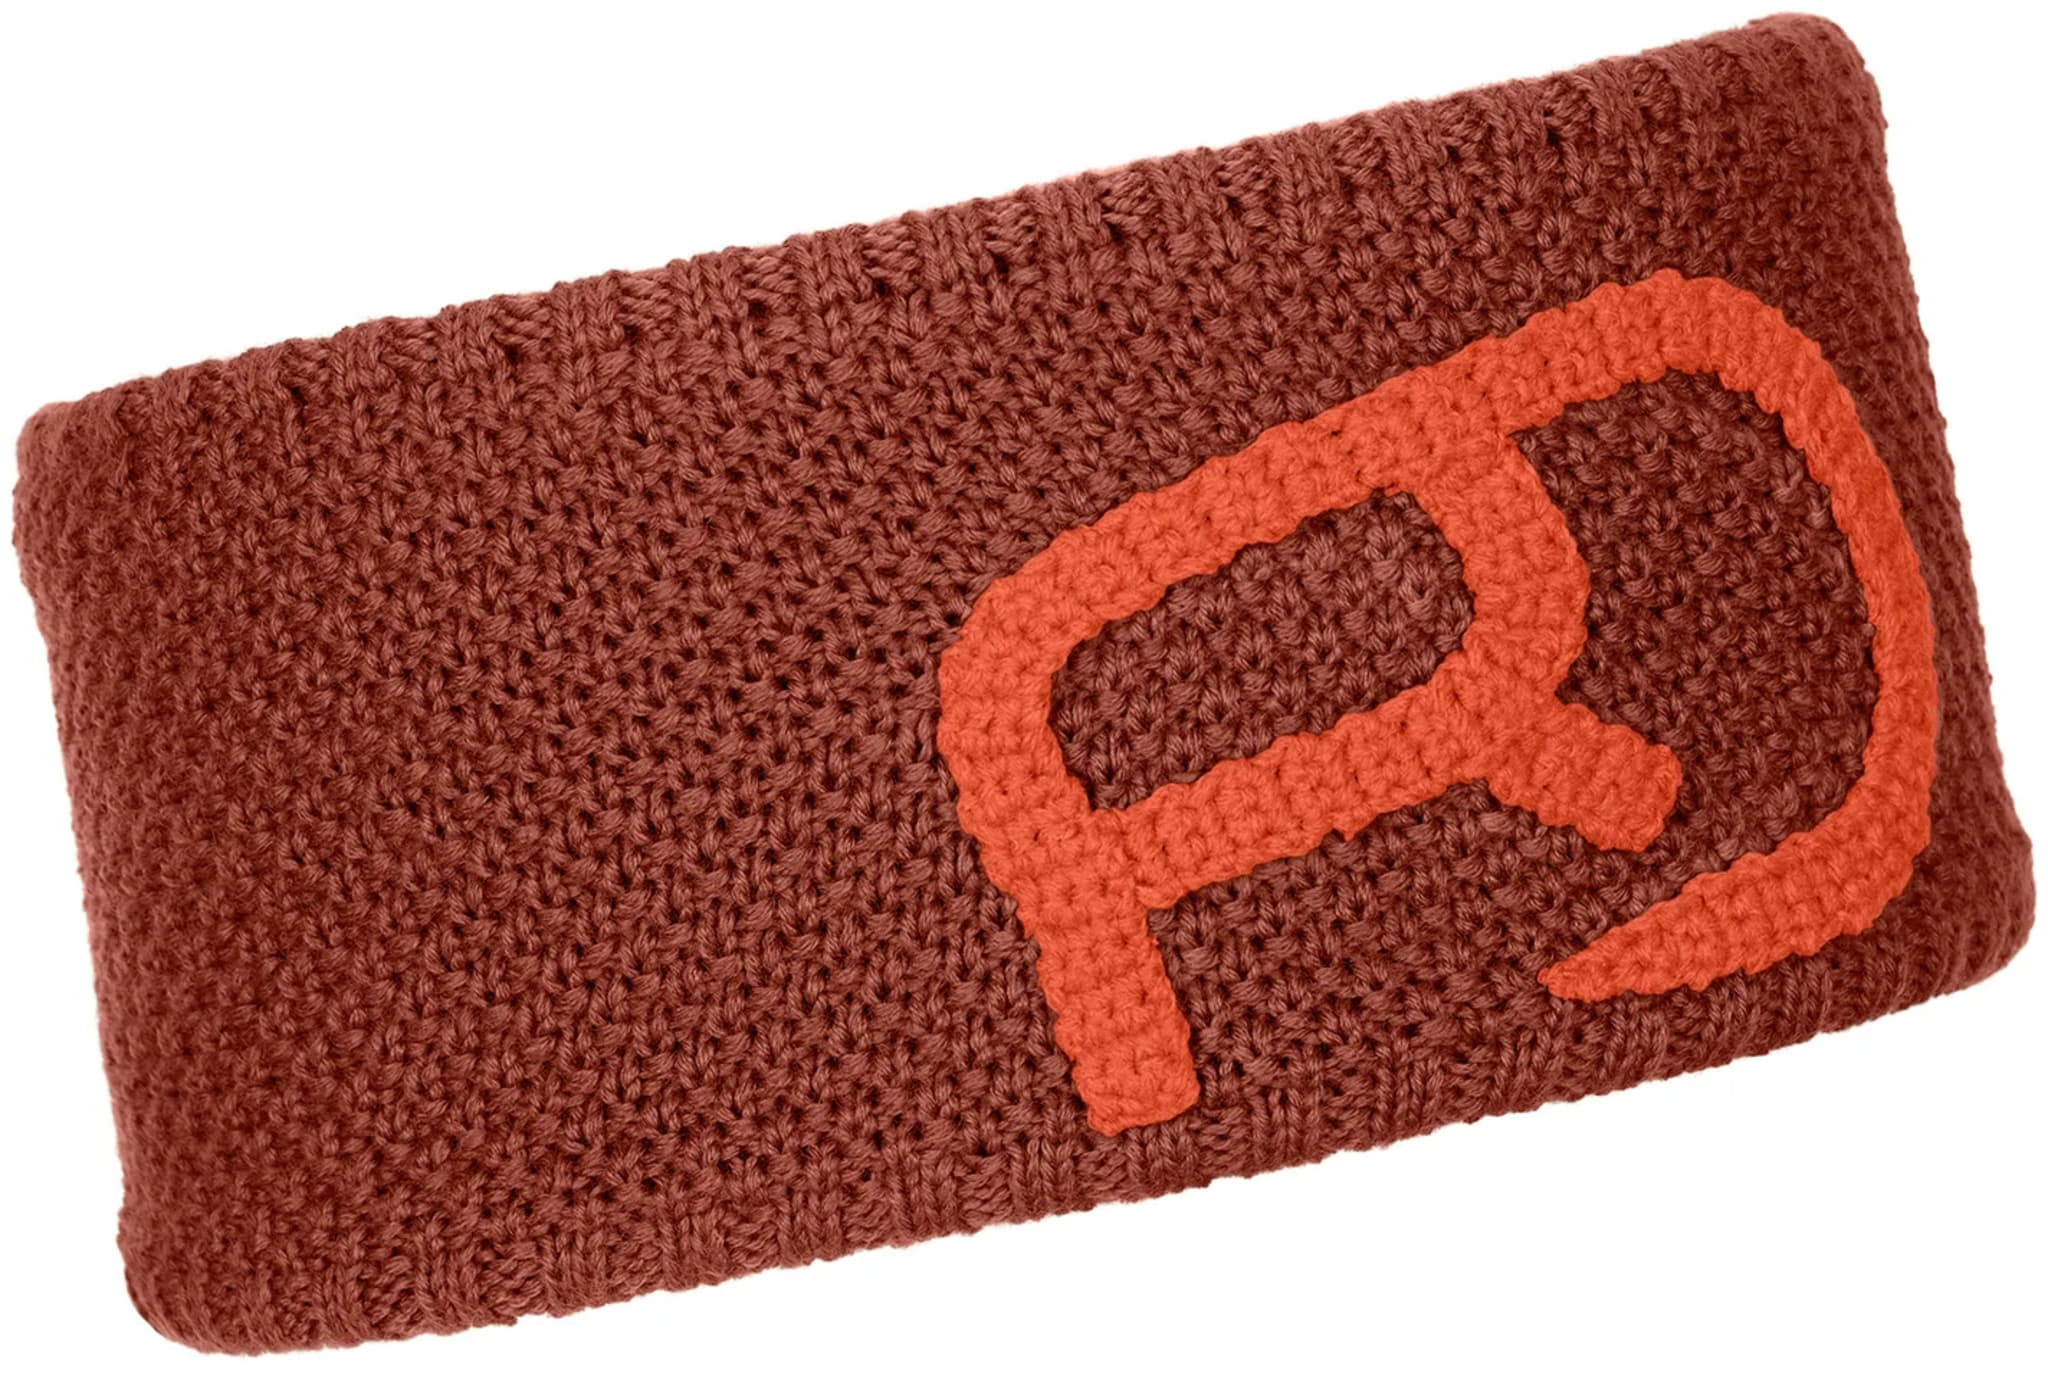 Rock 'N' Wool Headband M